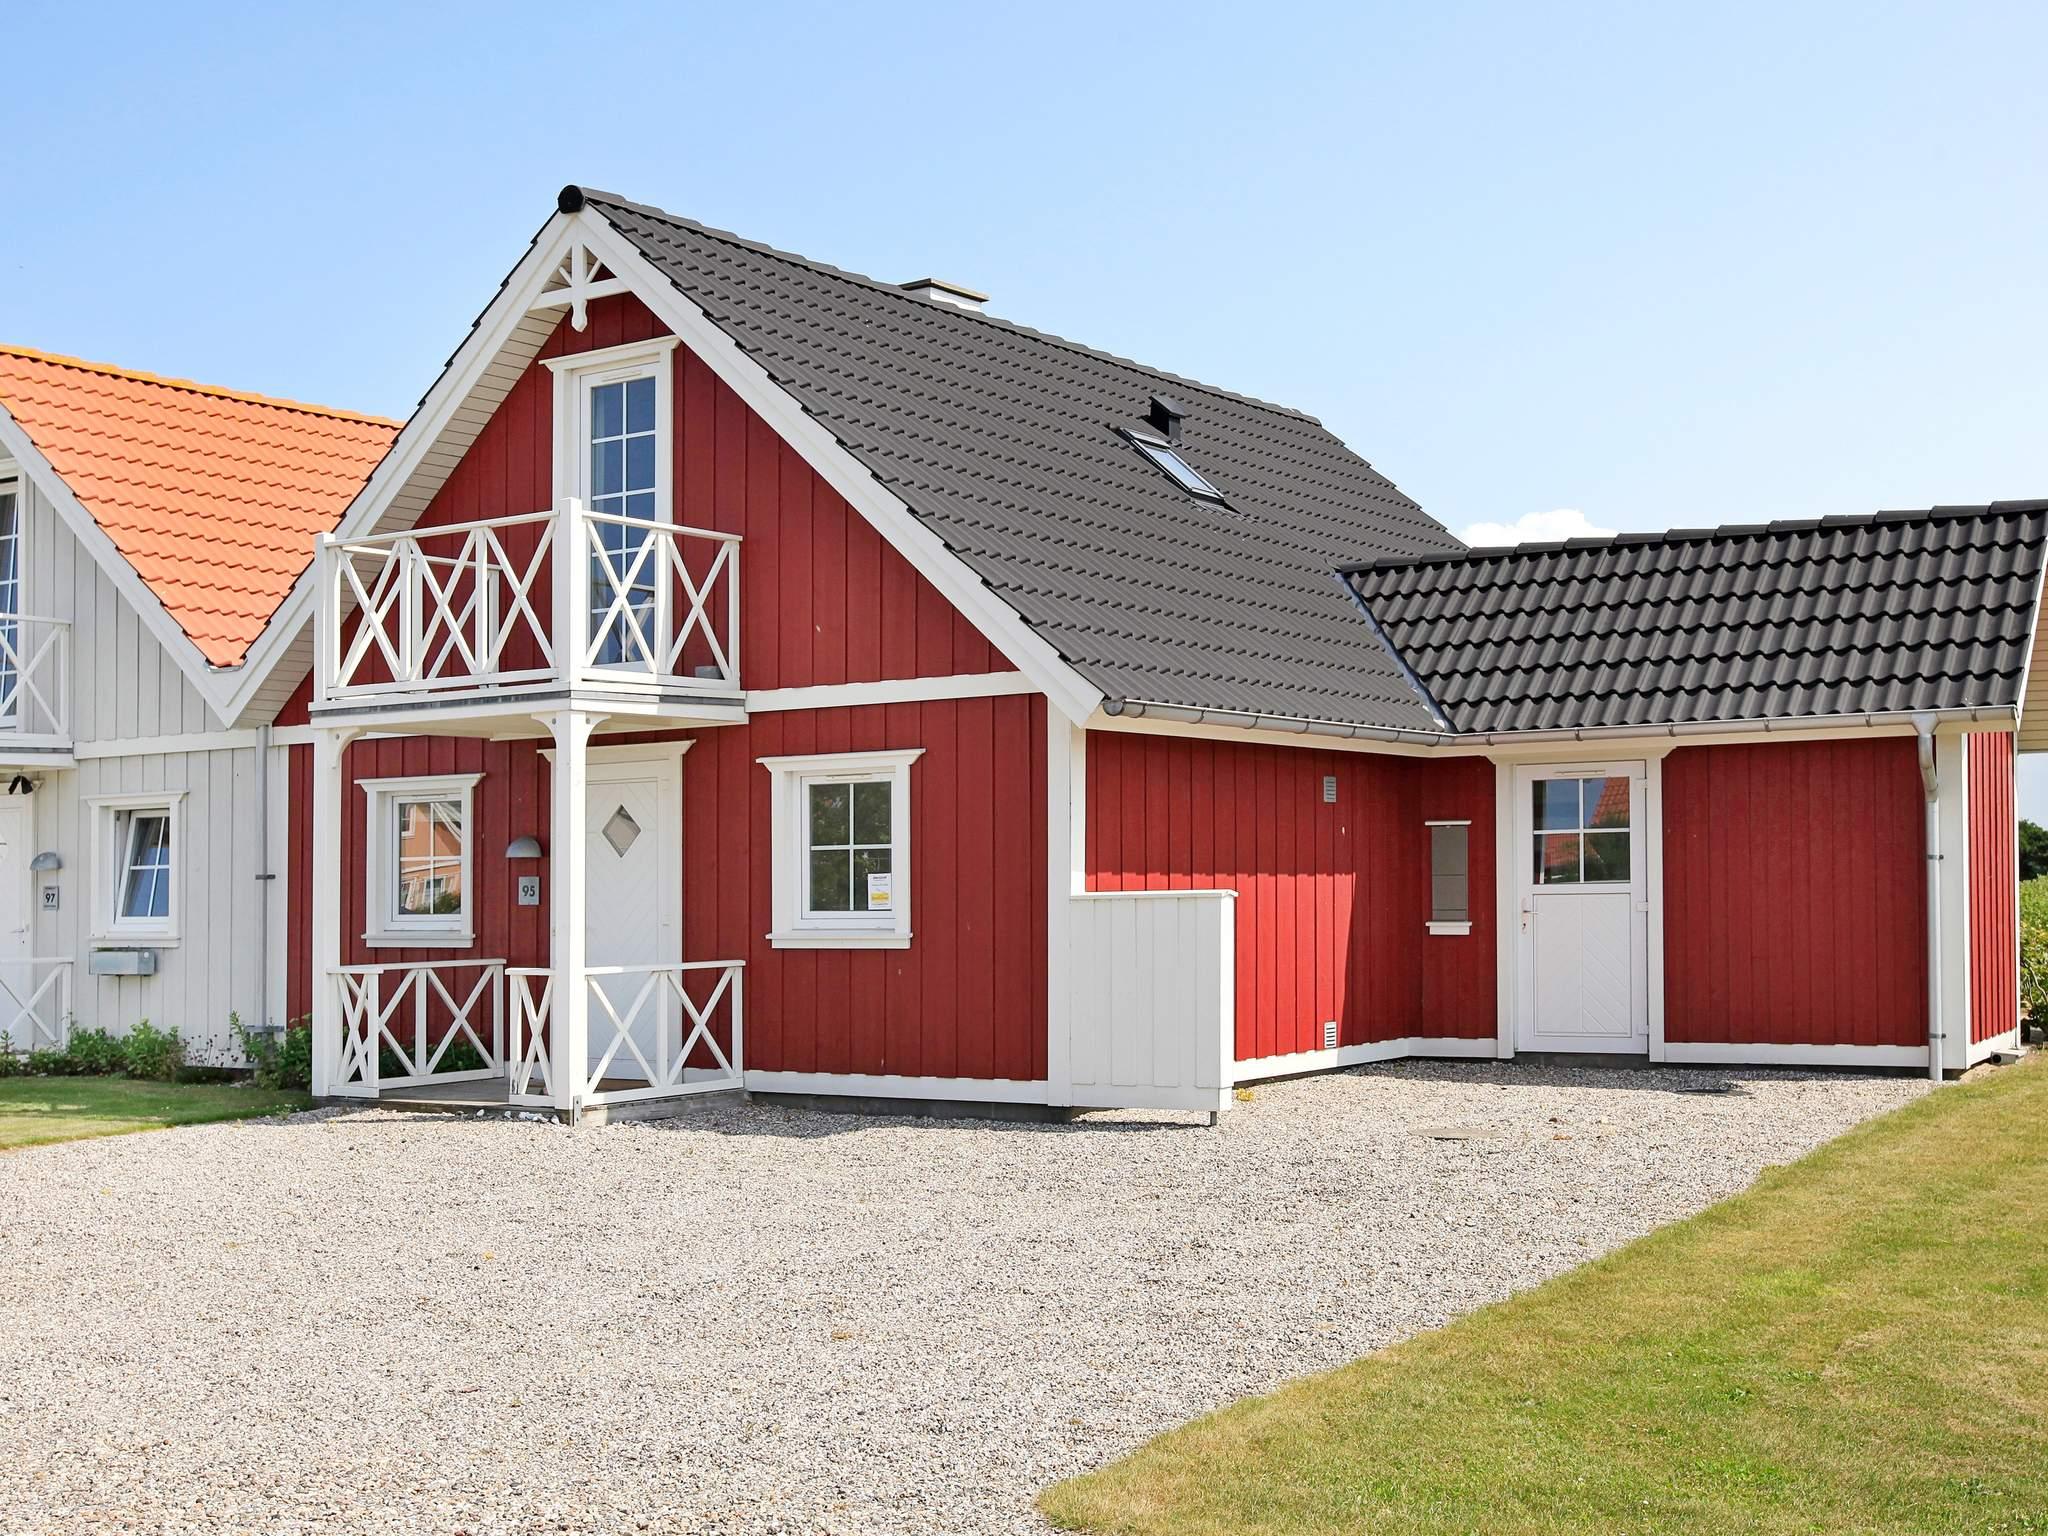 Ferienhaus Bro Strand (495161), Bro (DK), , Fünen, Dänemark, Bild 20